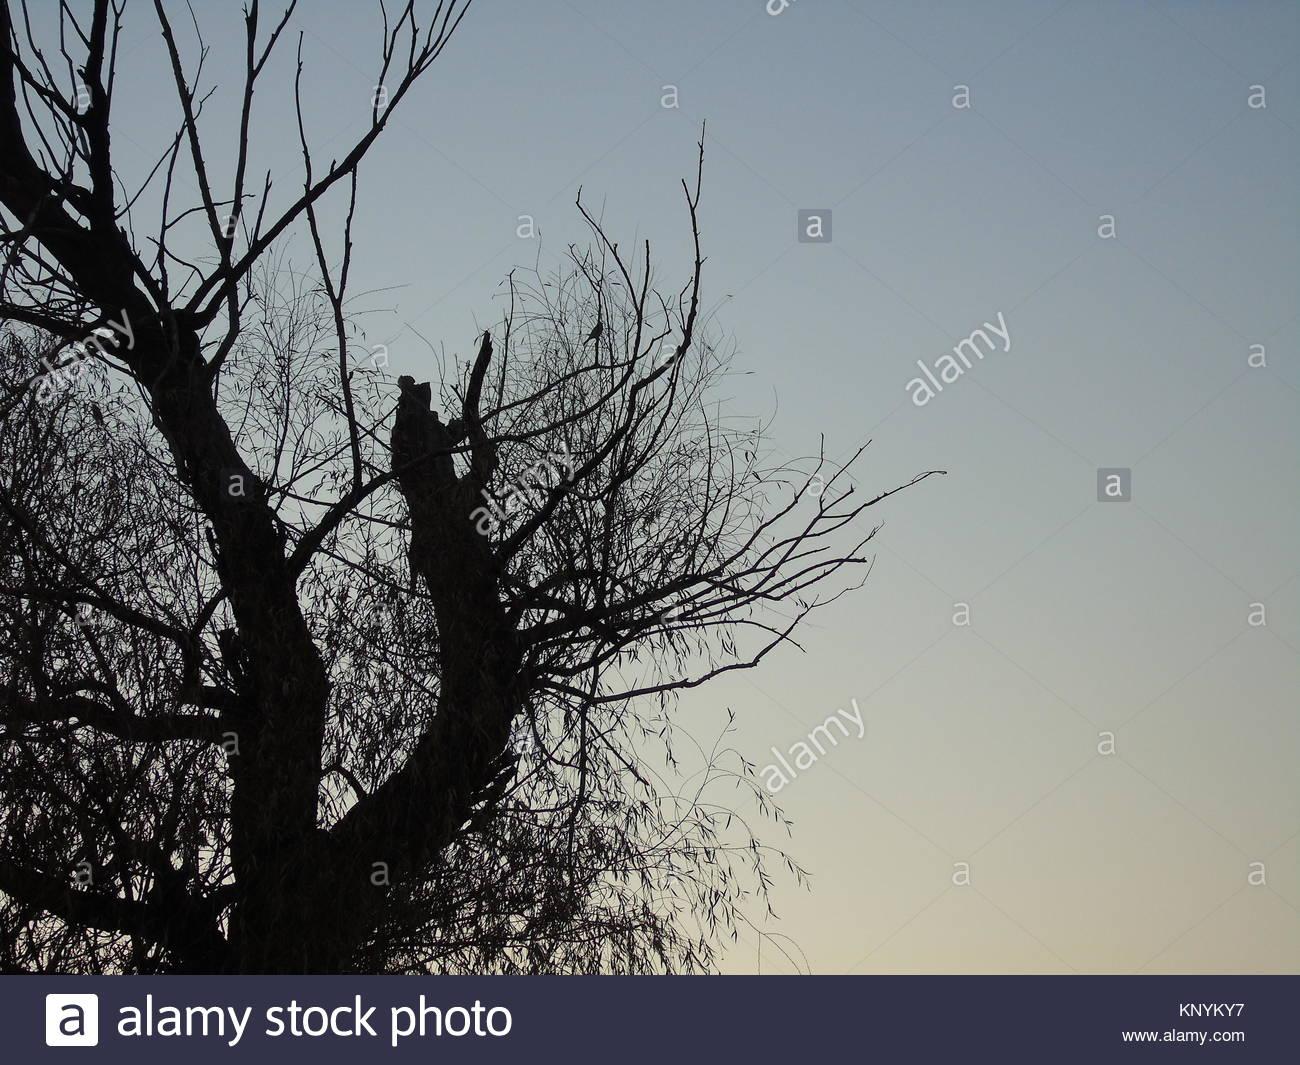 A poetic winter - Stock Image